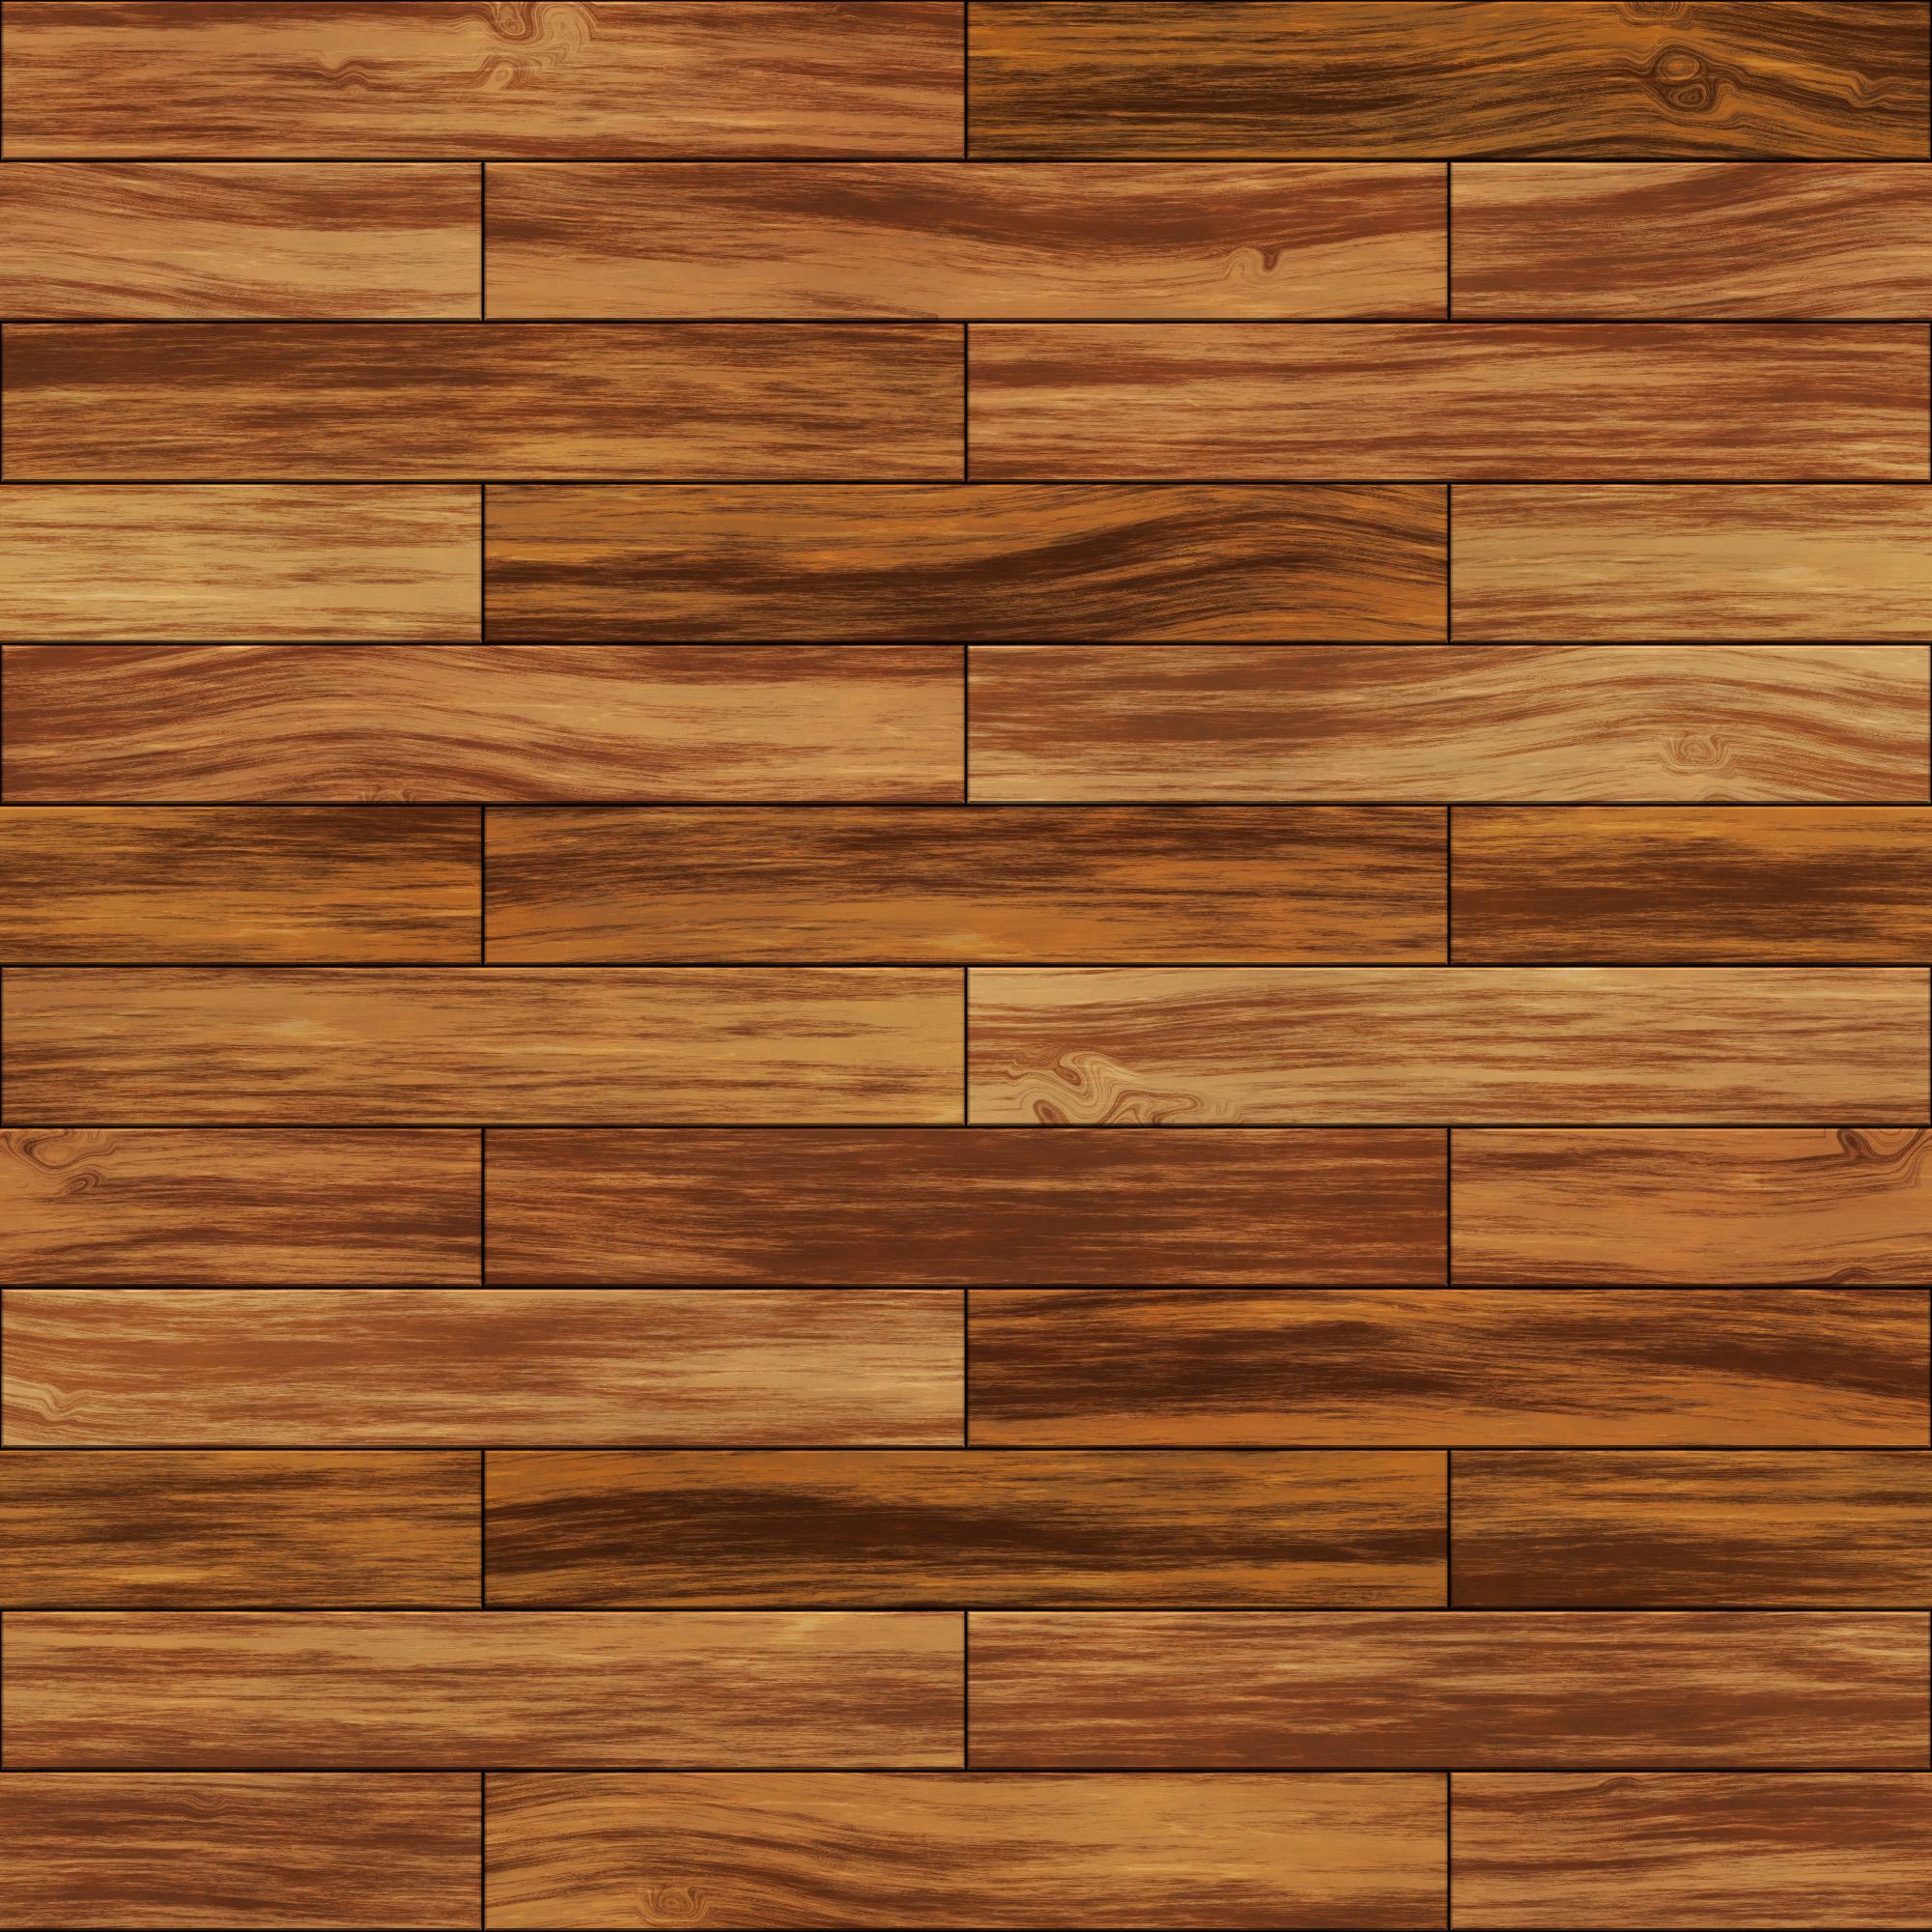 wood plank flooring seamless background wood planks 1 CDHFHLP